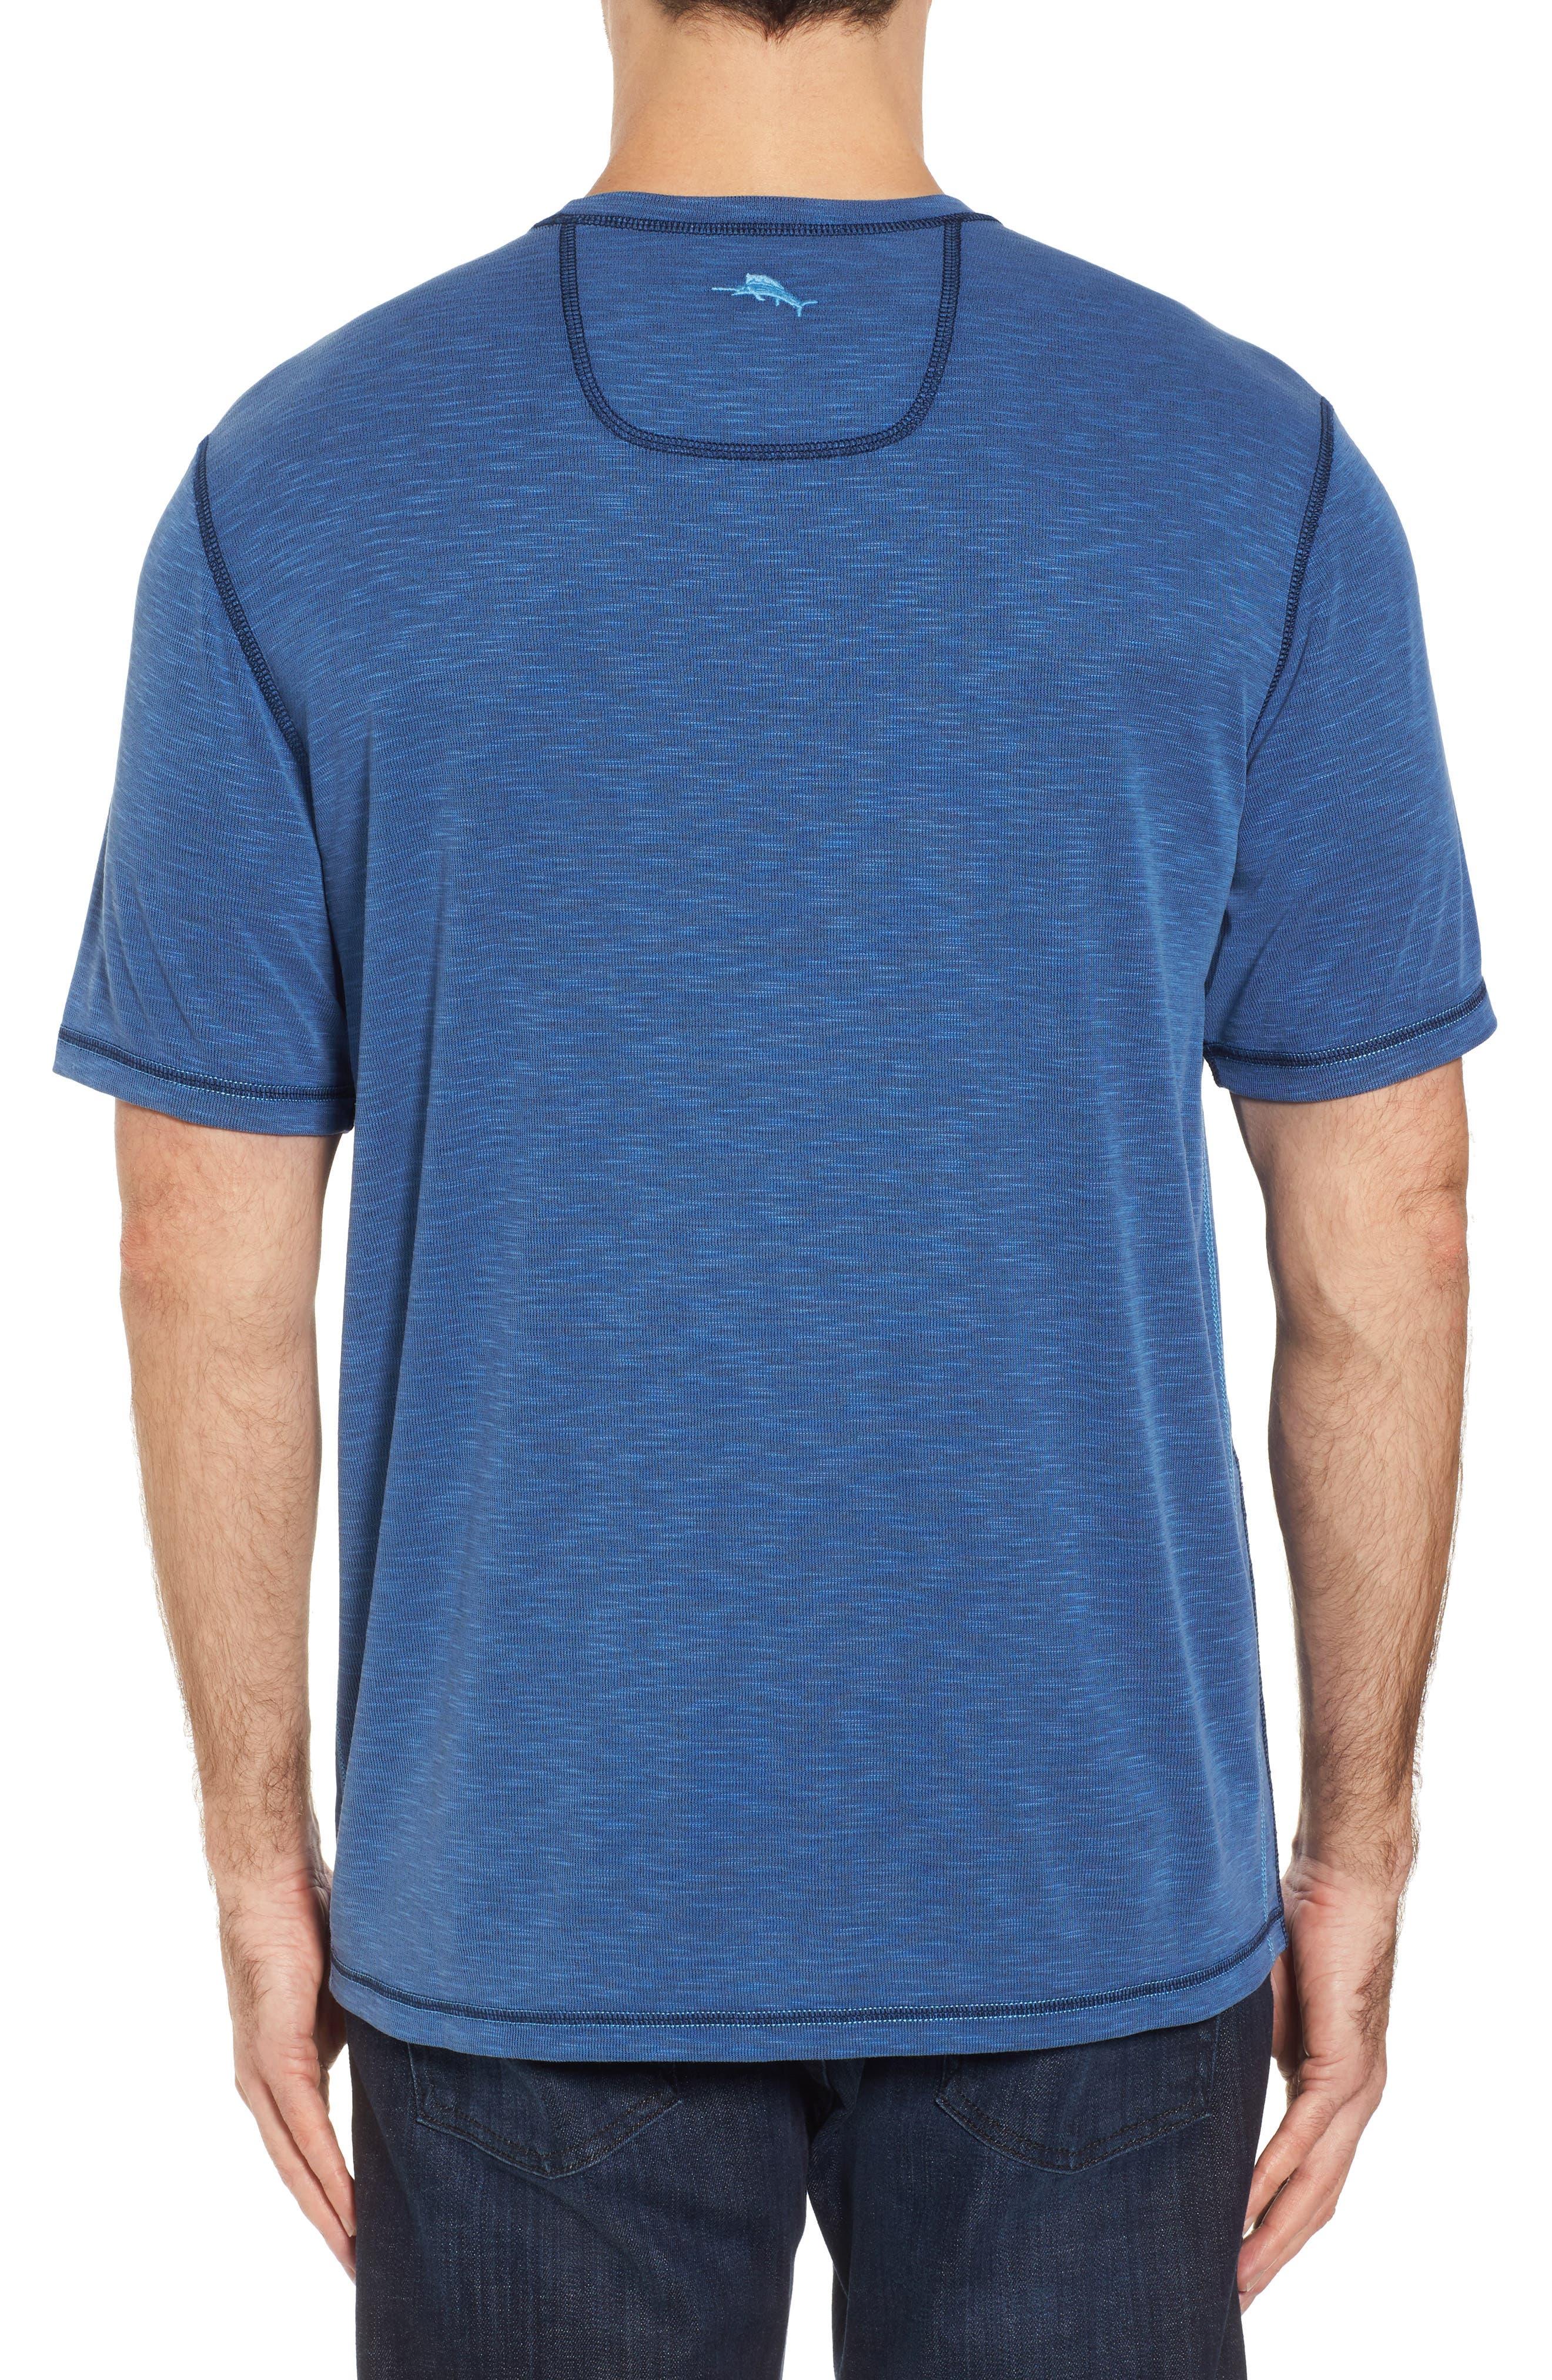 Flip Tide T-Shirt,                             Alternate thumbnail 3, color,                             Galaxy Blue